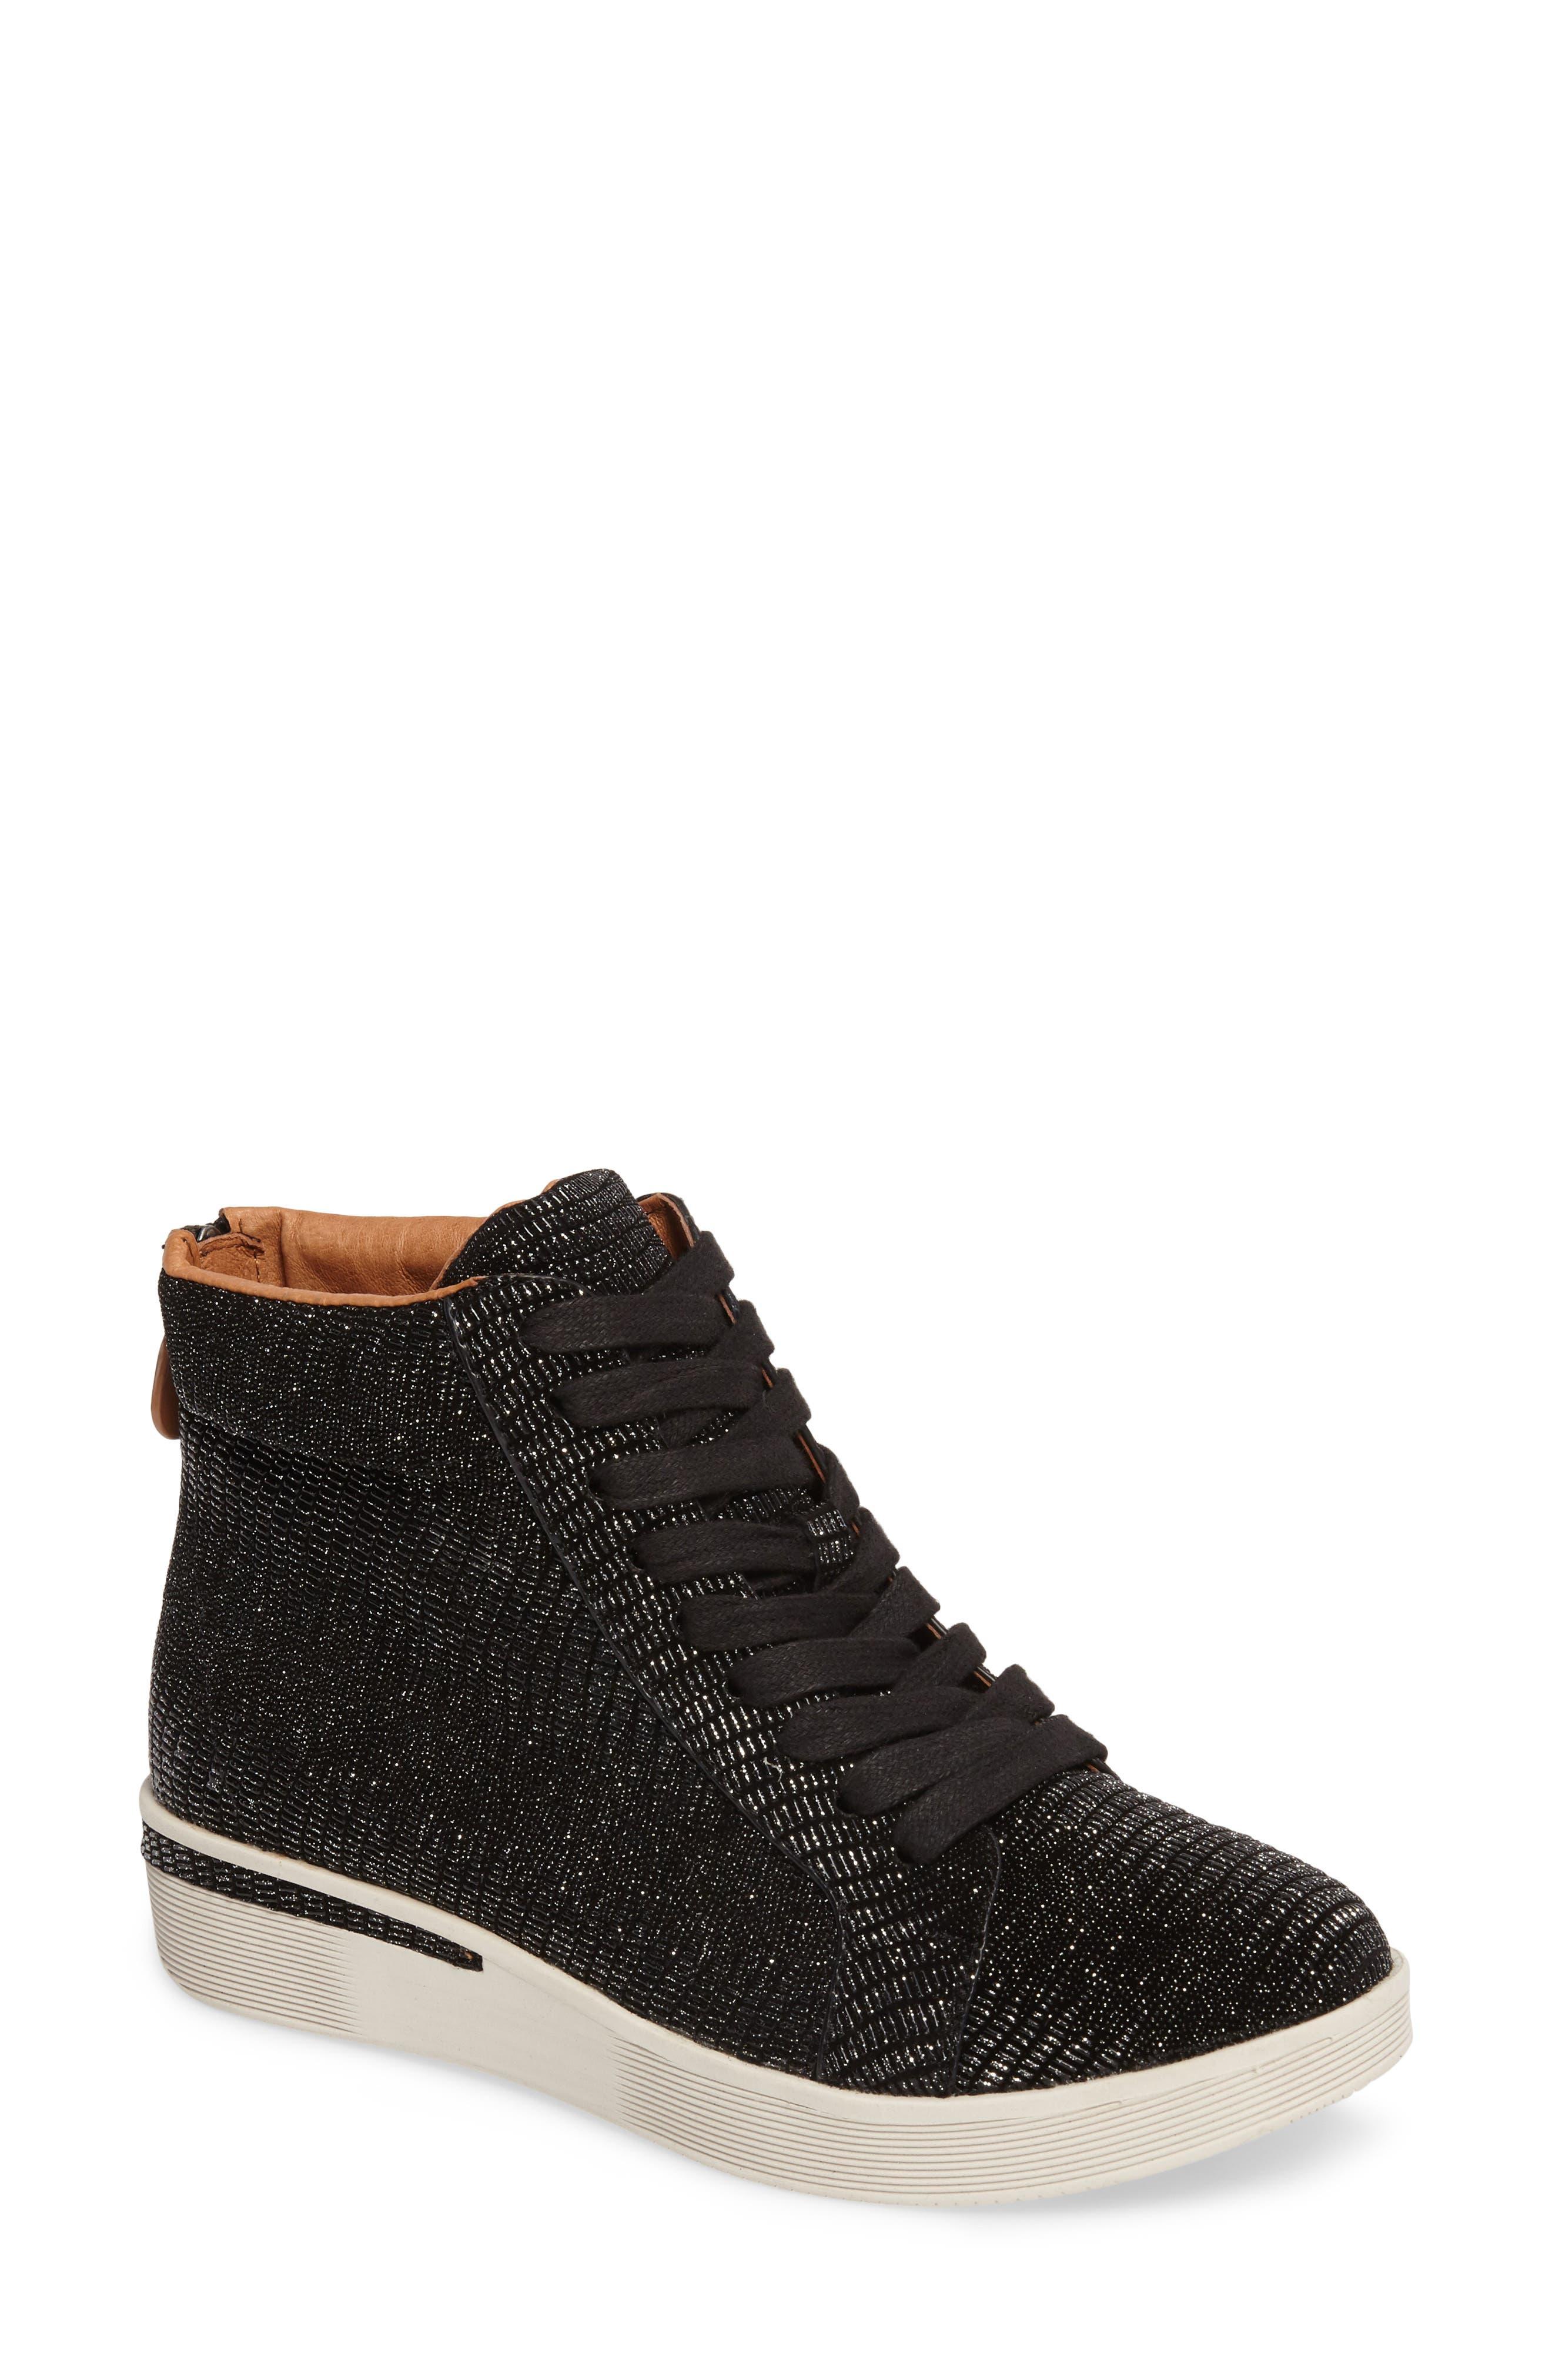 Helka High Top Sneaker,                             Main thumbnail 1, color,                             Black Metallic Leather